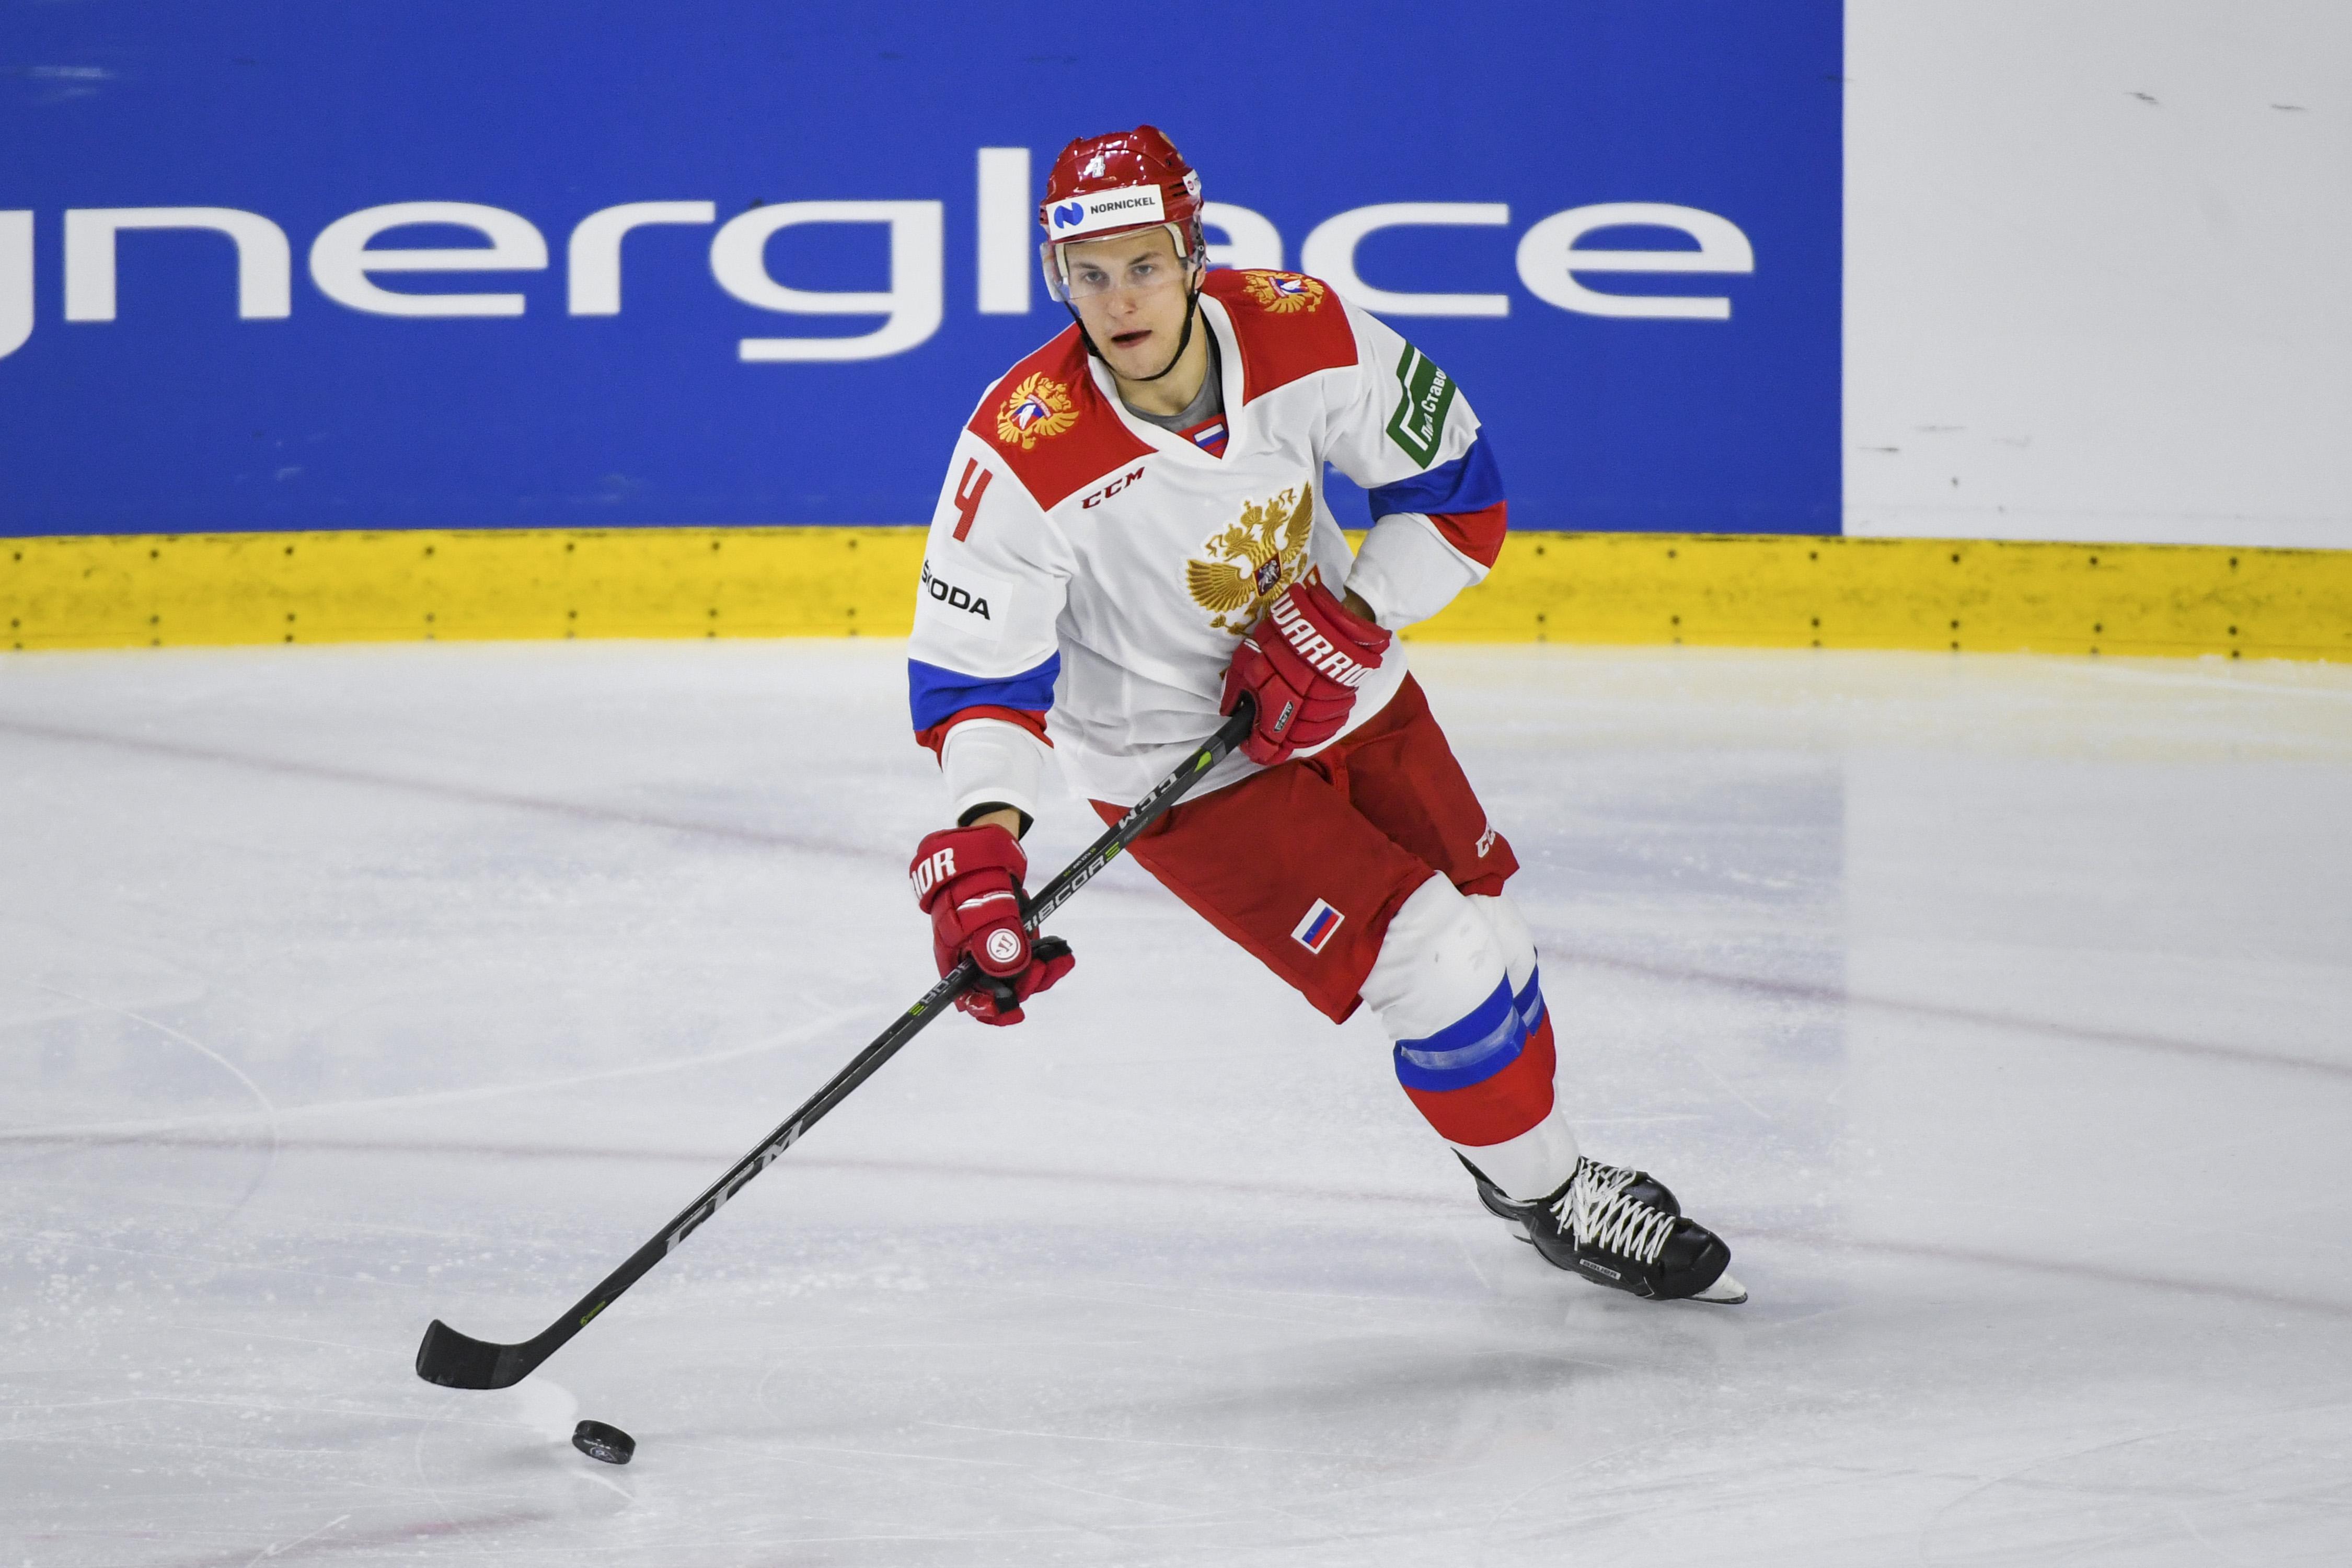 France v Russia - International Friendly Ice Hockey